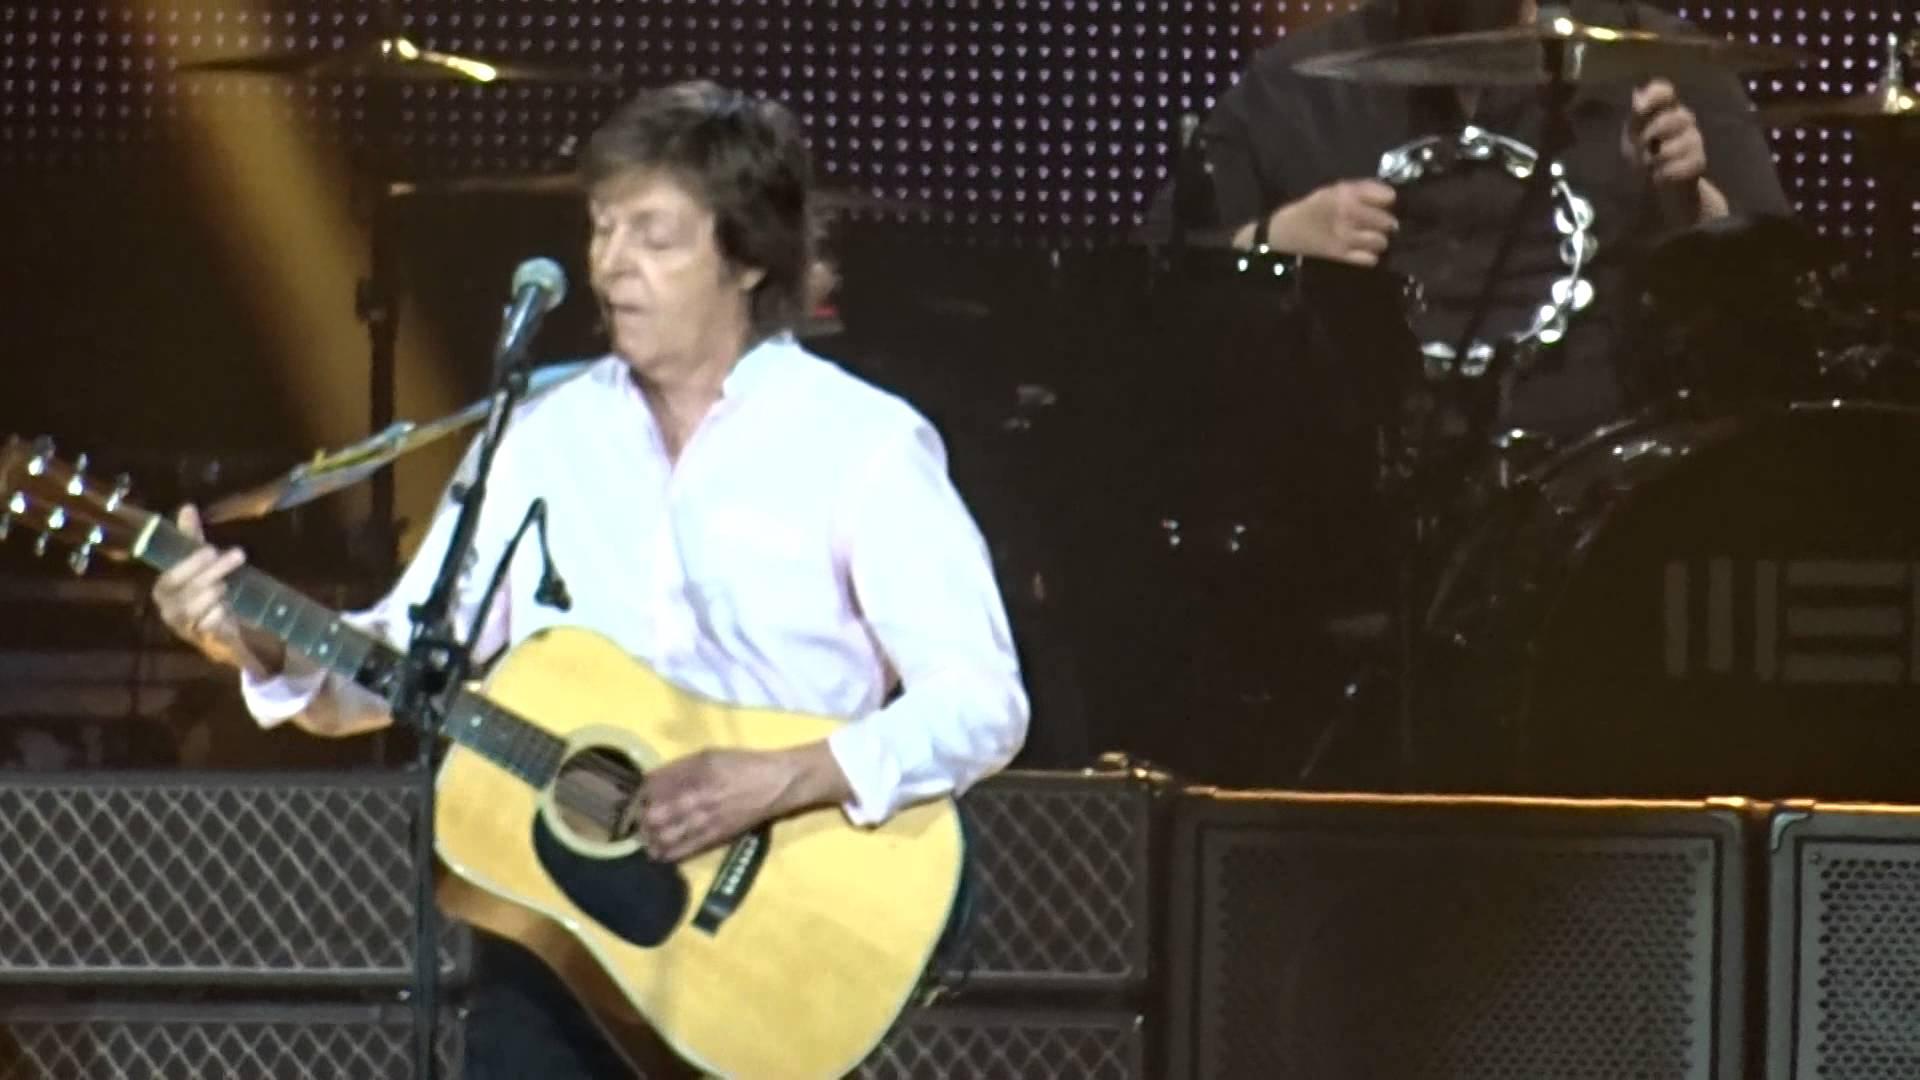 Paul McCartney treats fans again at second London show